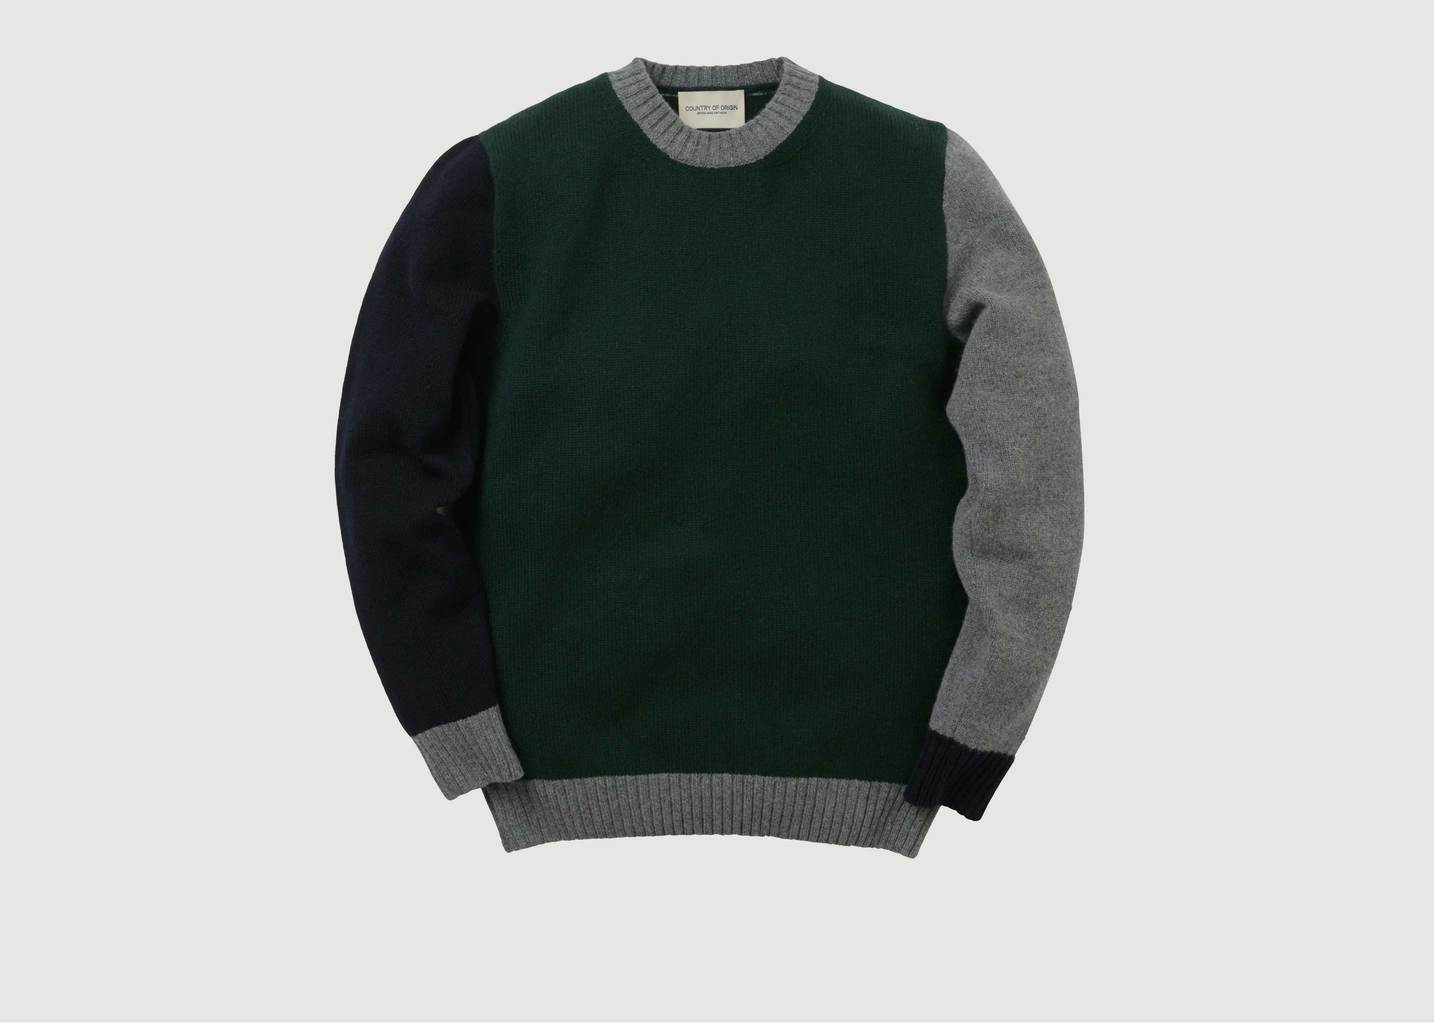 Pull Tricolore Green Dark Navy - Country of Origin